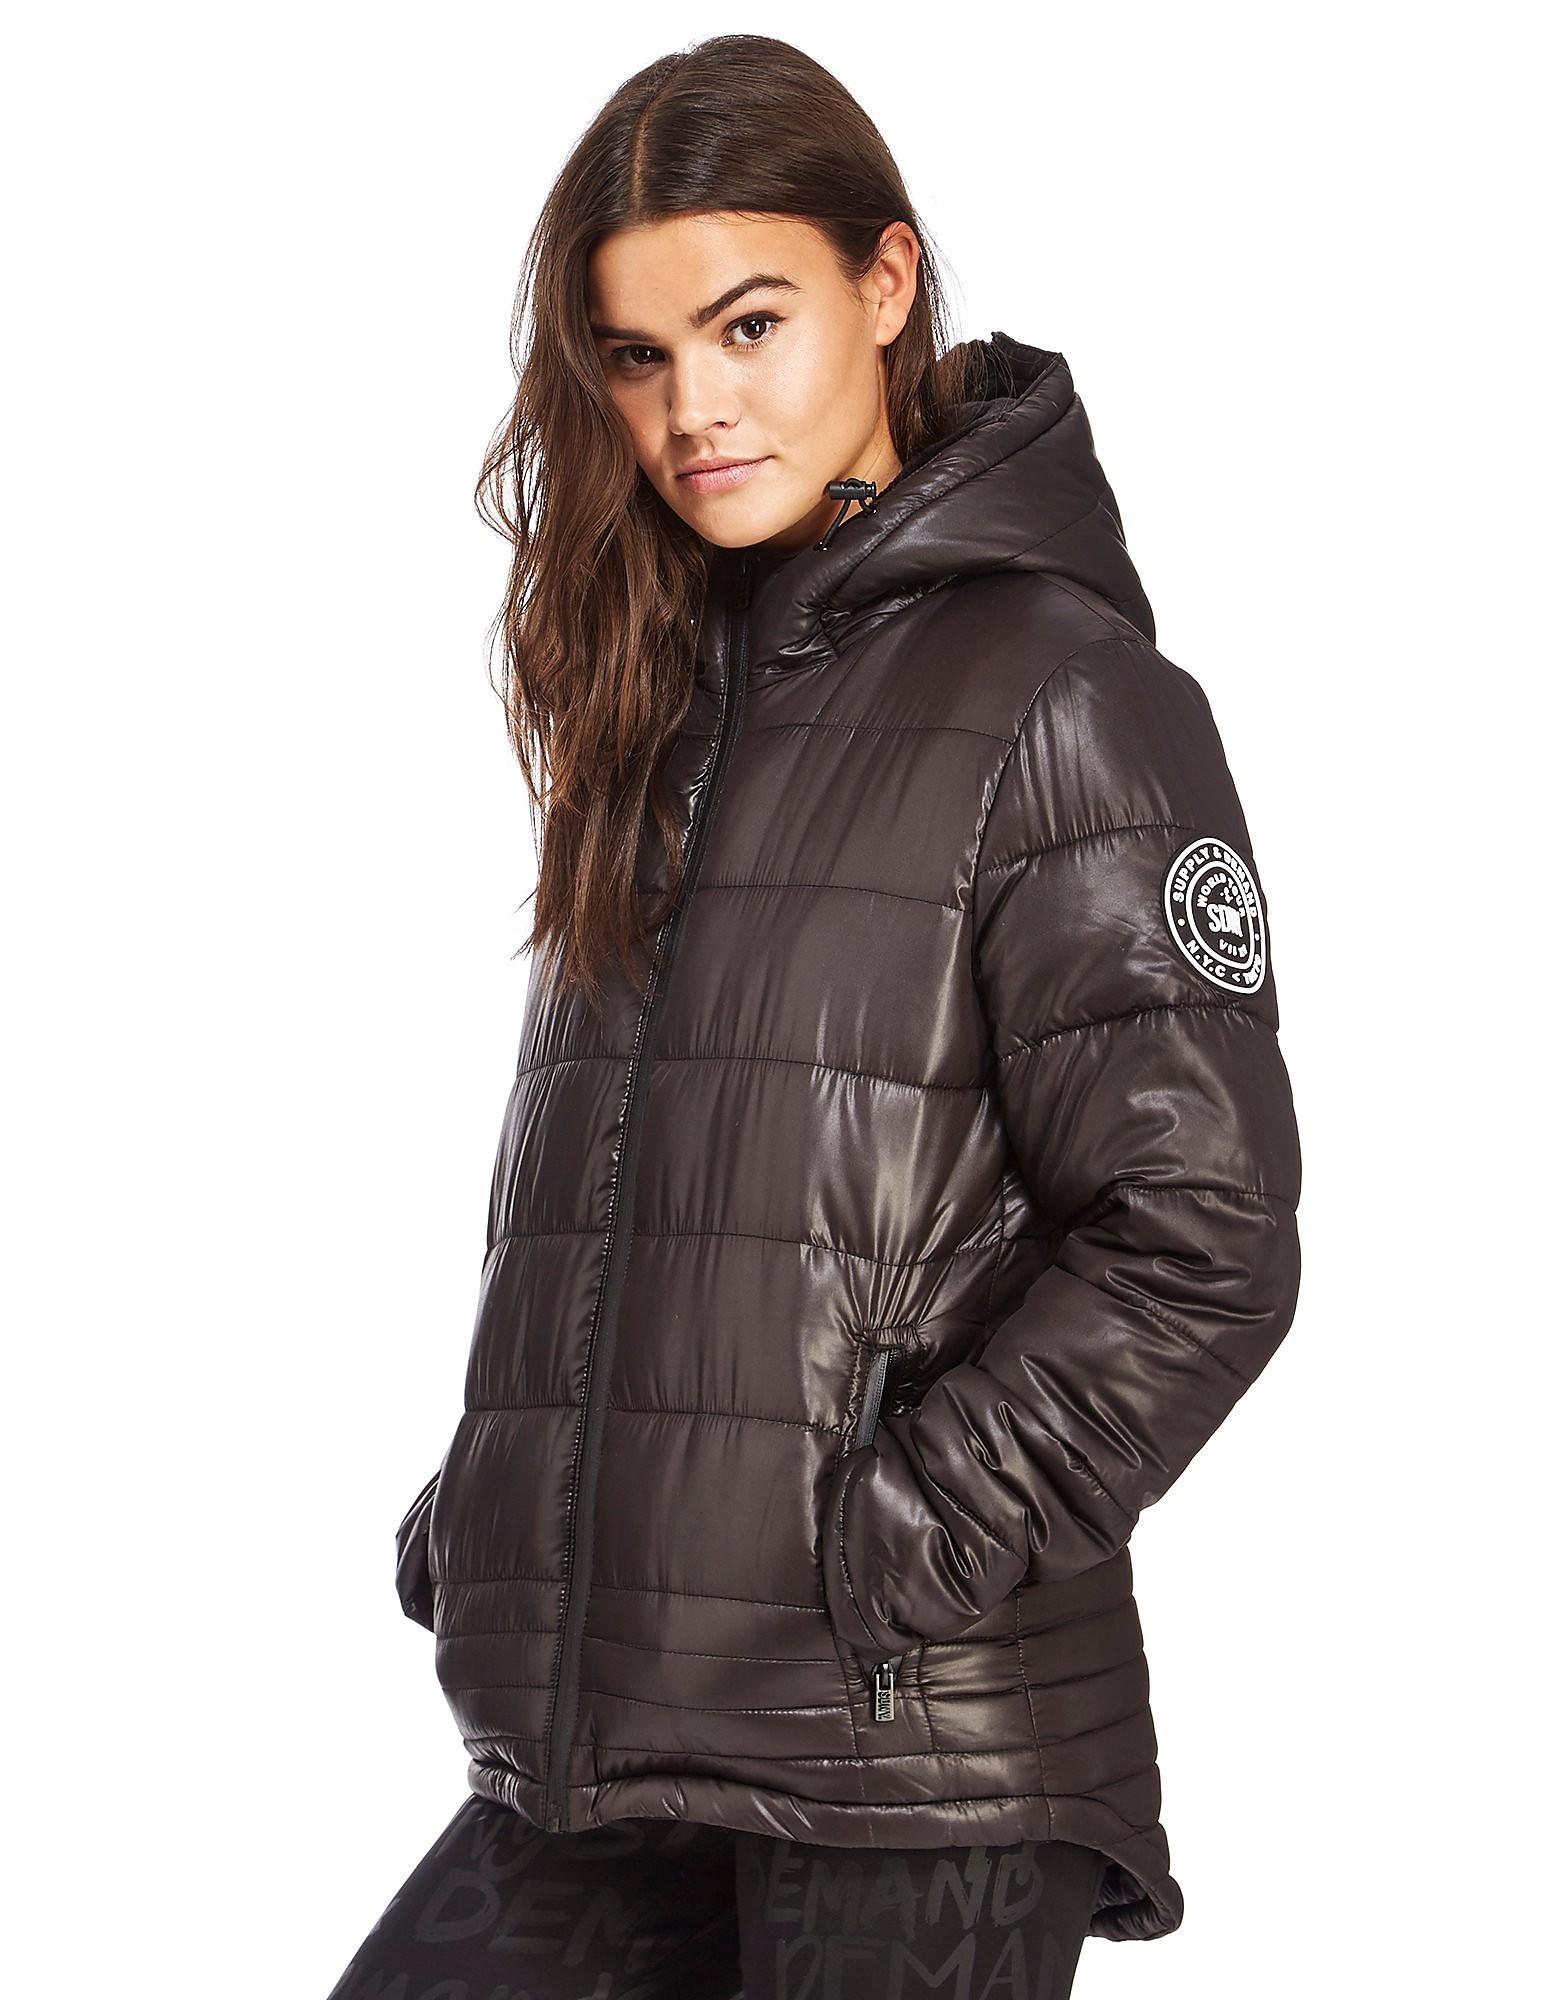 Supply & Demand Irregular Quilt Jacket